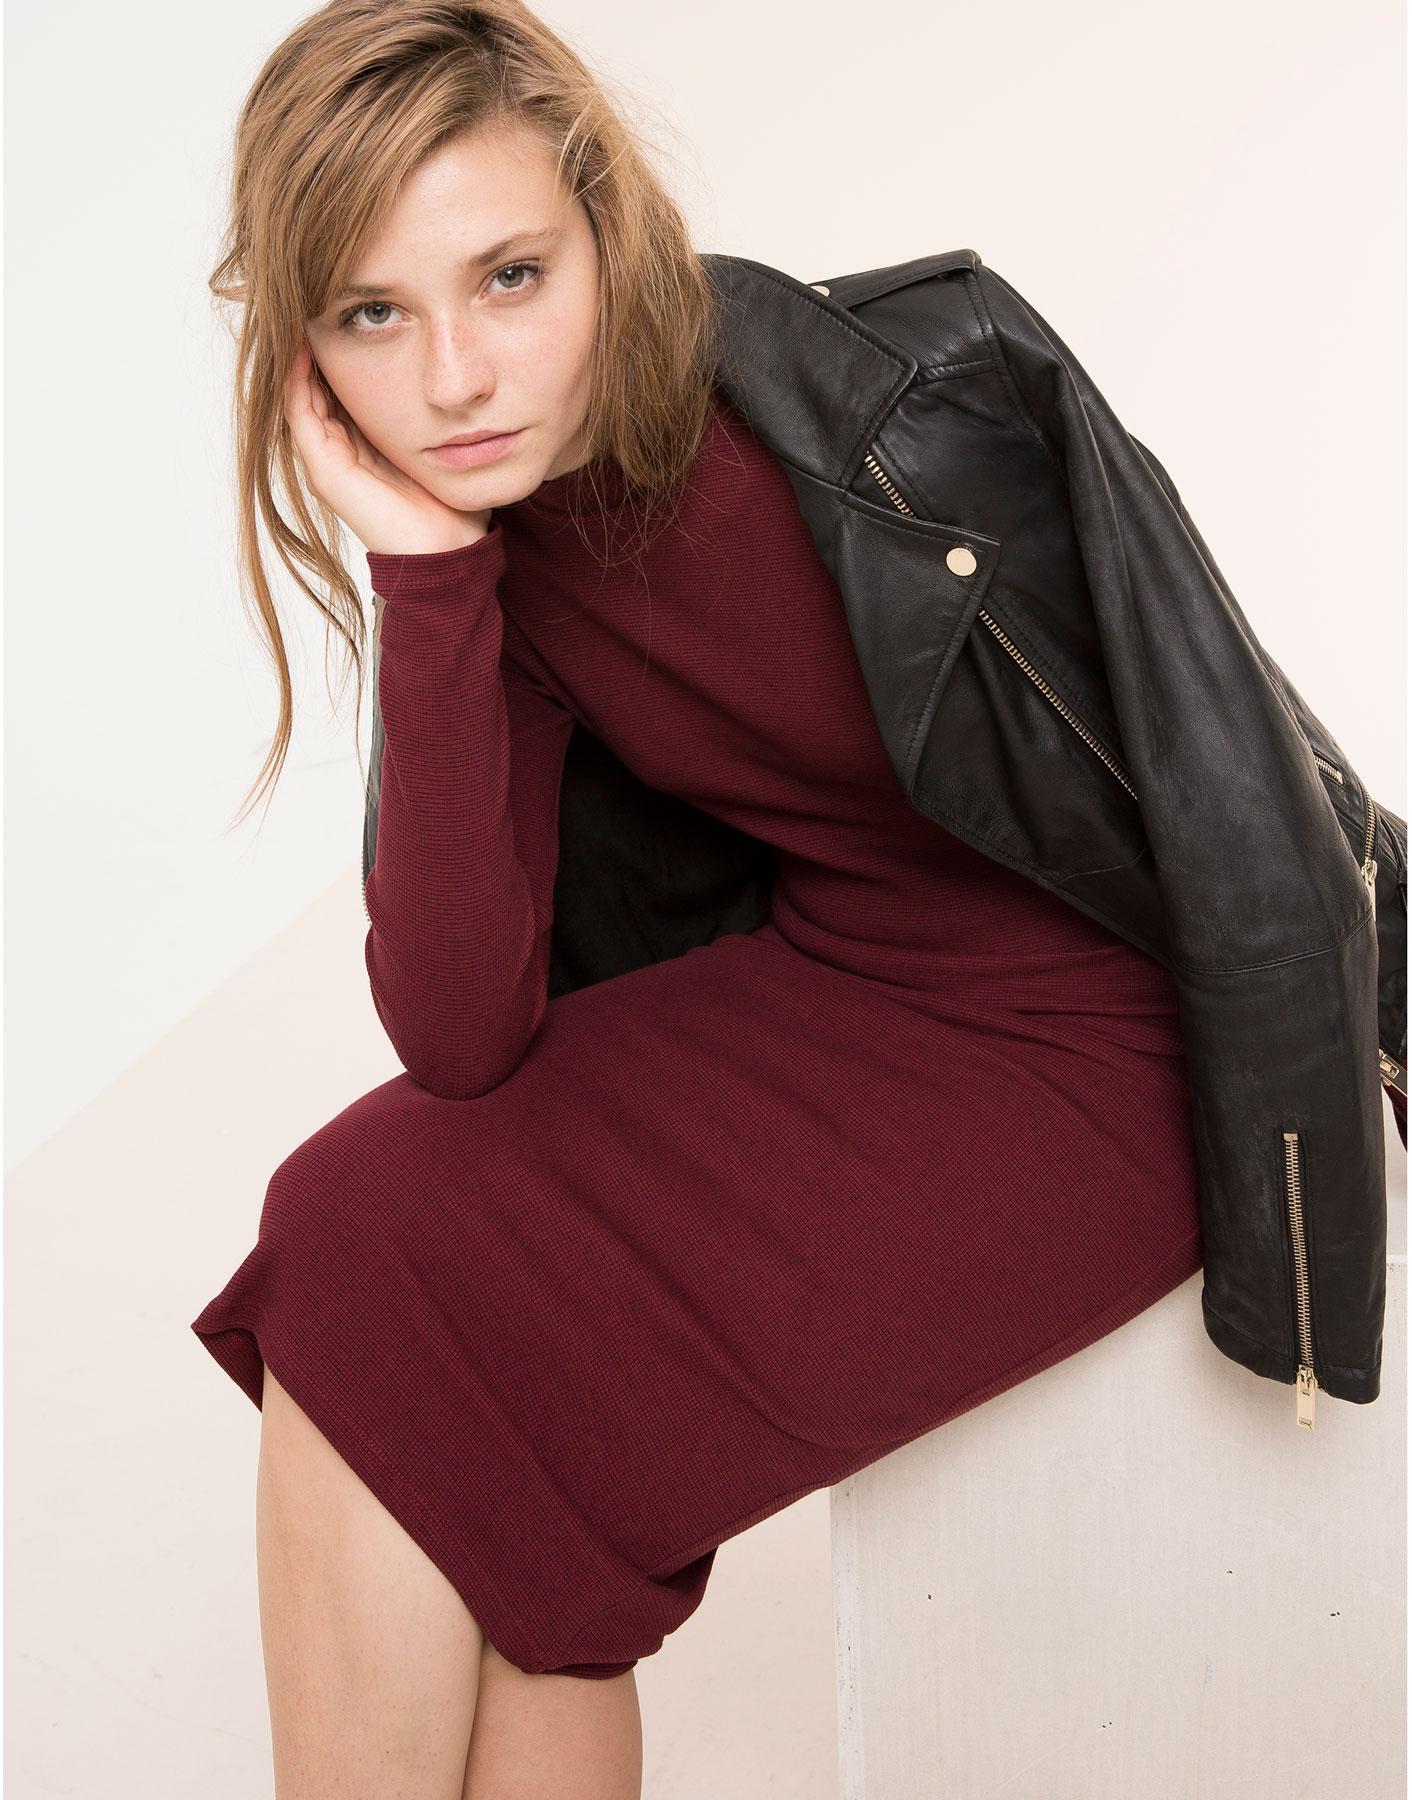 bce78308921 Προτείνουμε τα πιο cool pull and bear φορέματα